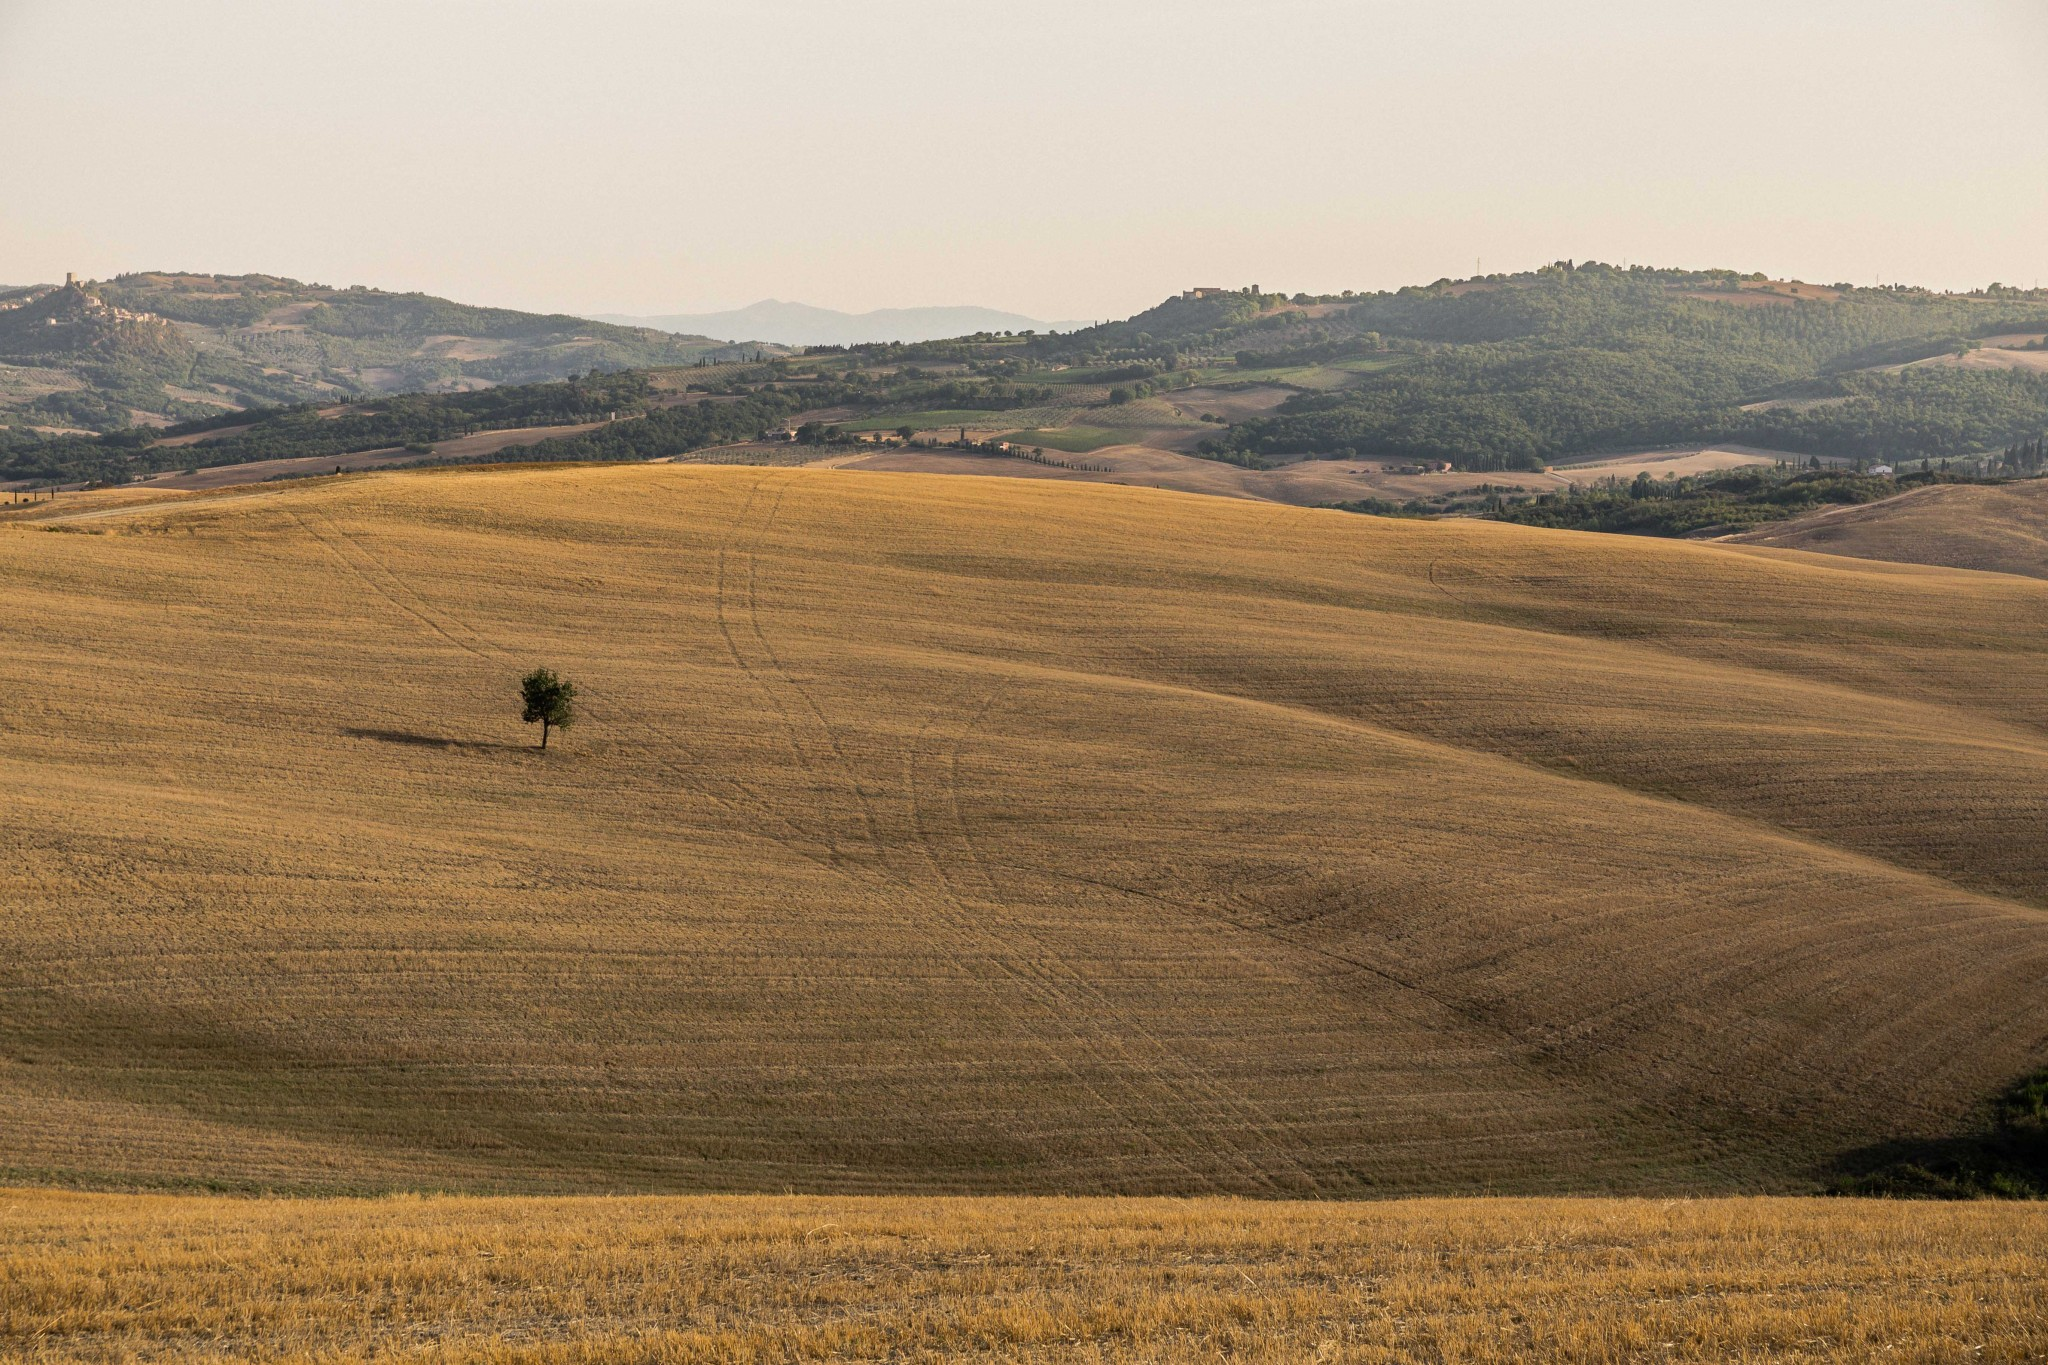 tuscany2 (29 of 39)